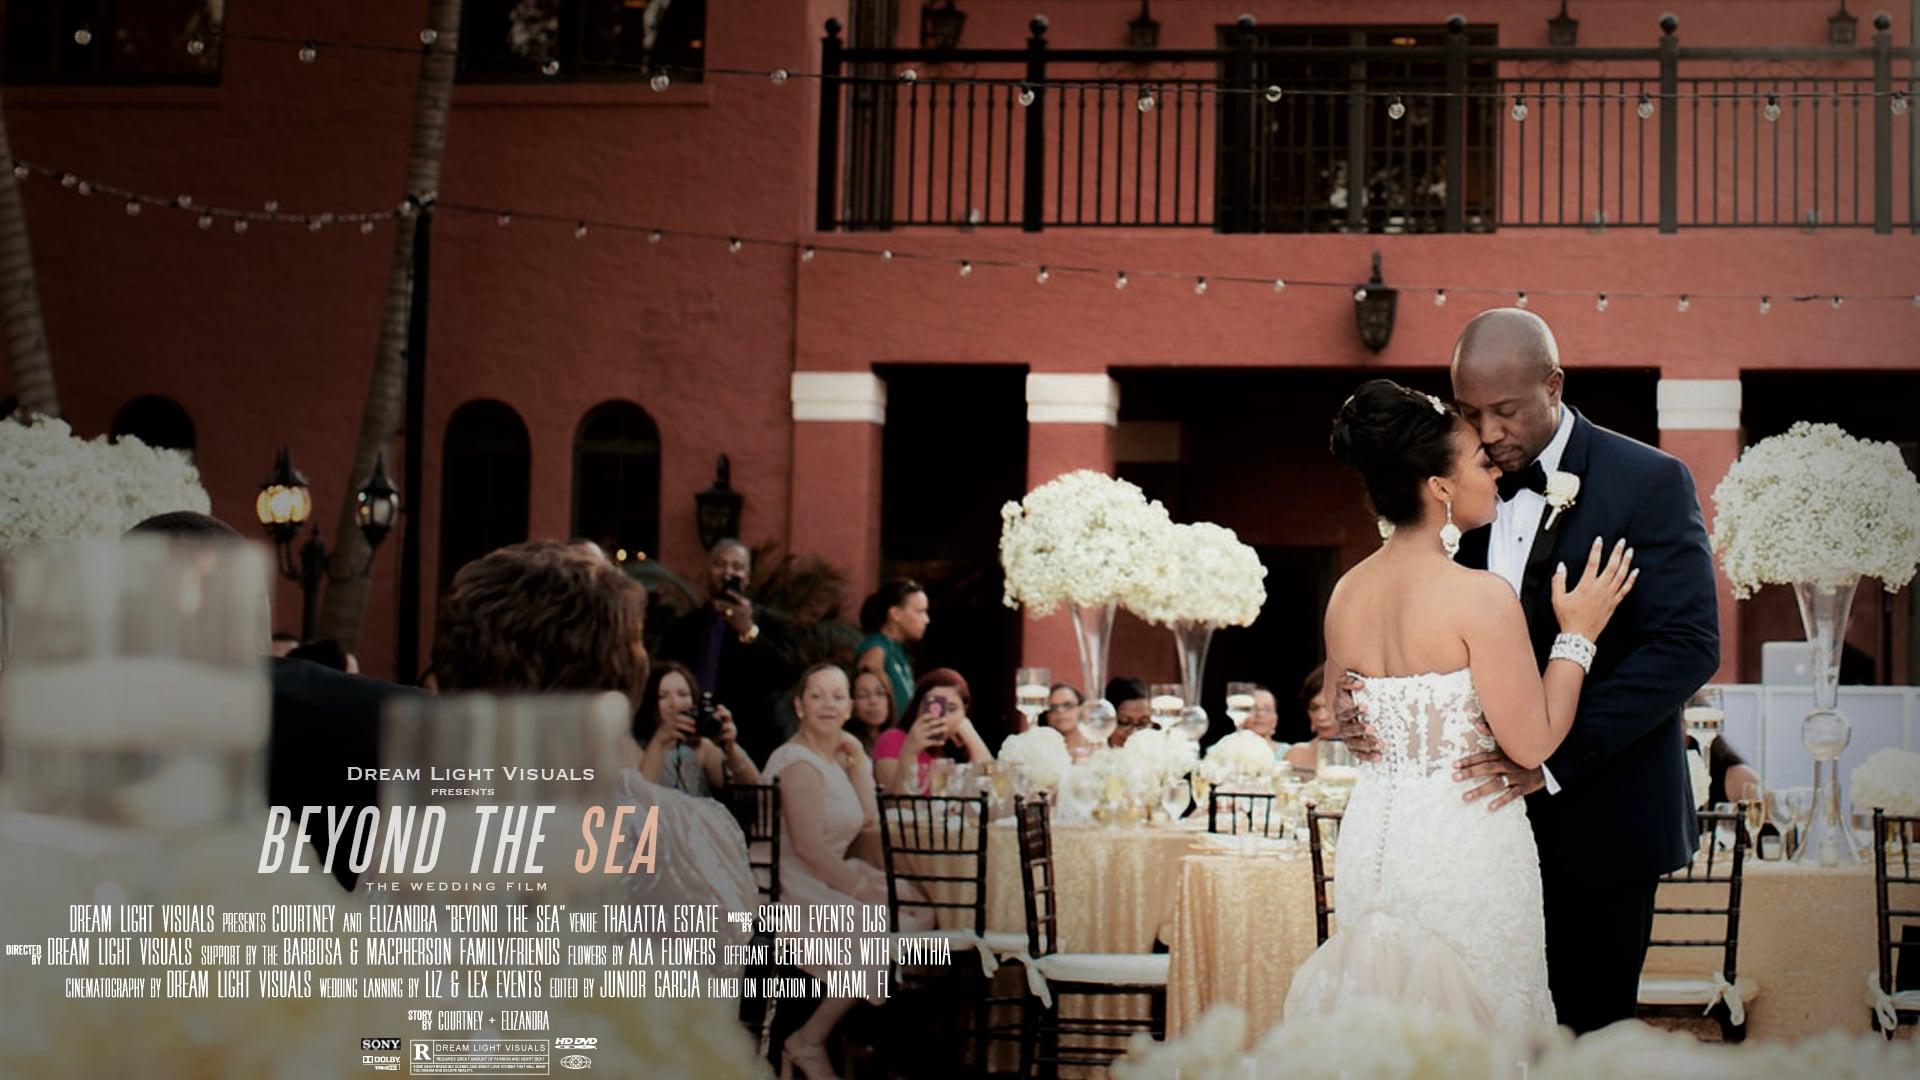 Thalatta Estate Wedding Film | Miami, FL | Courtney & Elizandra